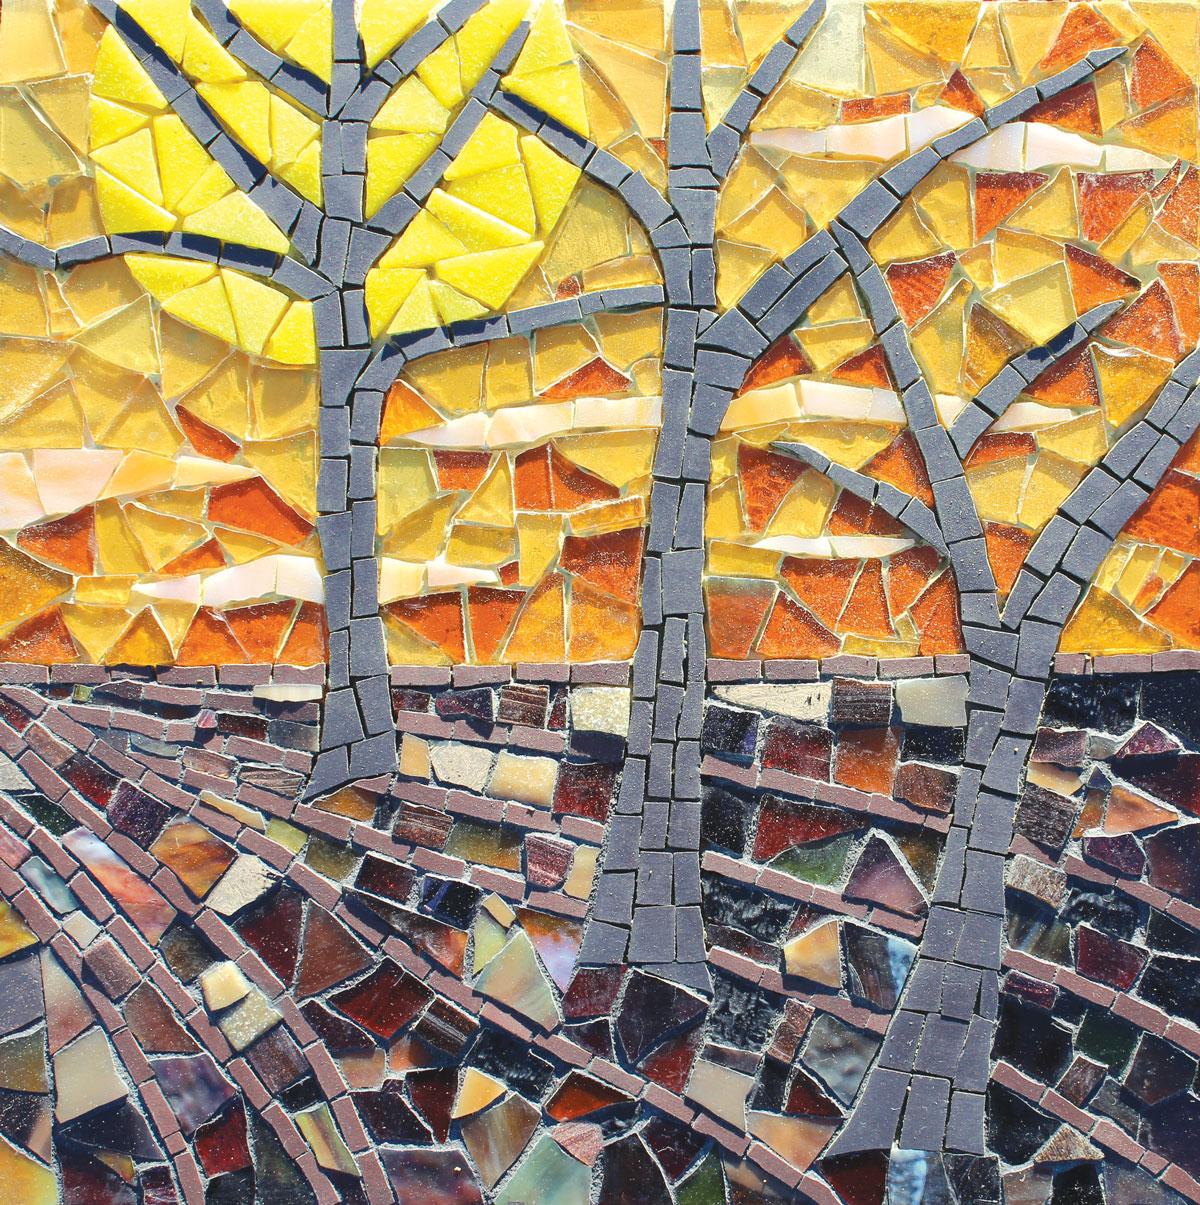 """Sunset Mosaic"" - Autor: Sue Kershaw"